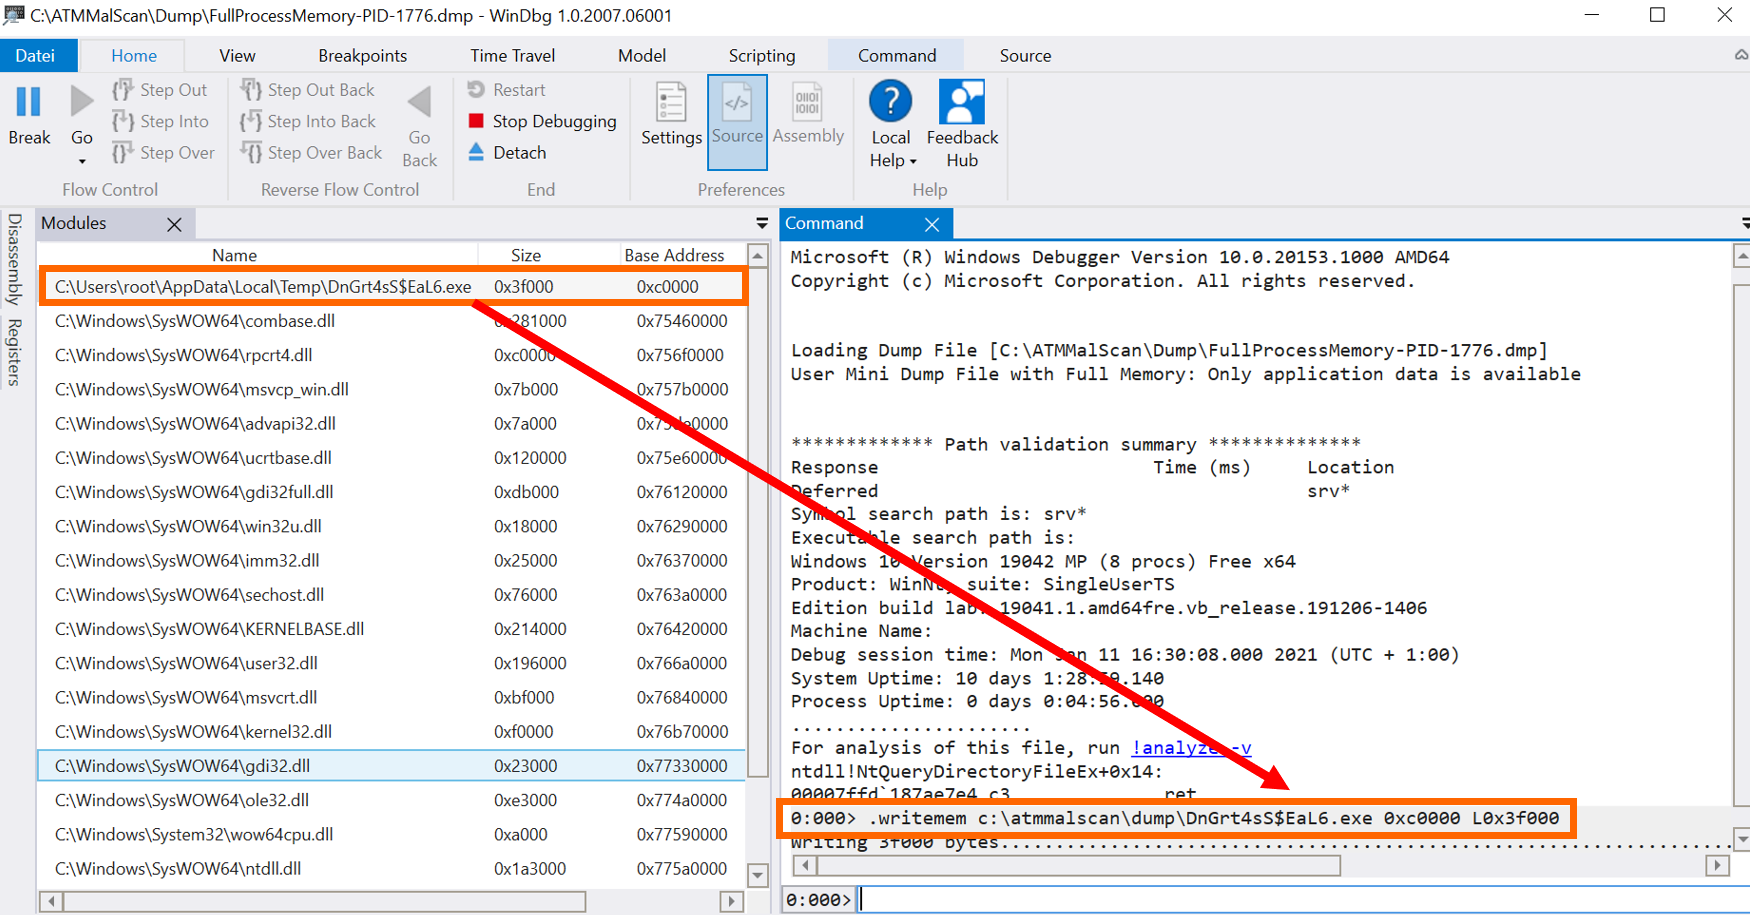 4 Windbg Malware Extraction - ATMMalScan: Βρες malware σε συσκευές ATM